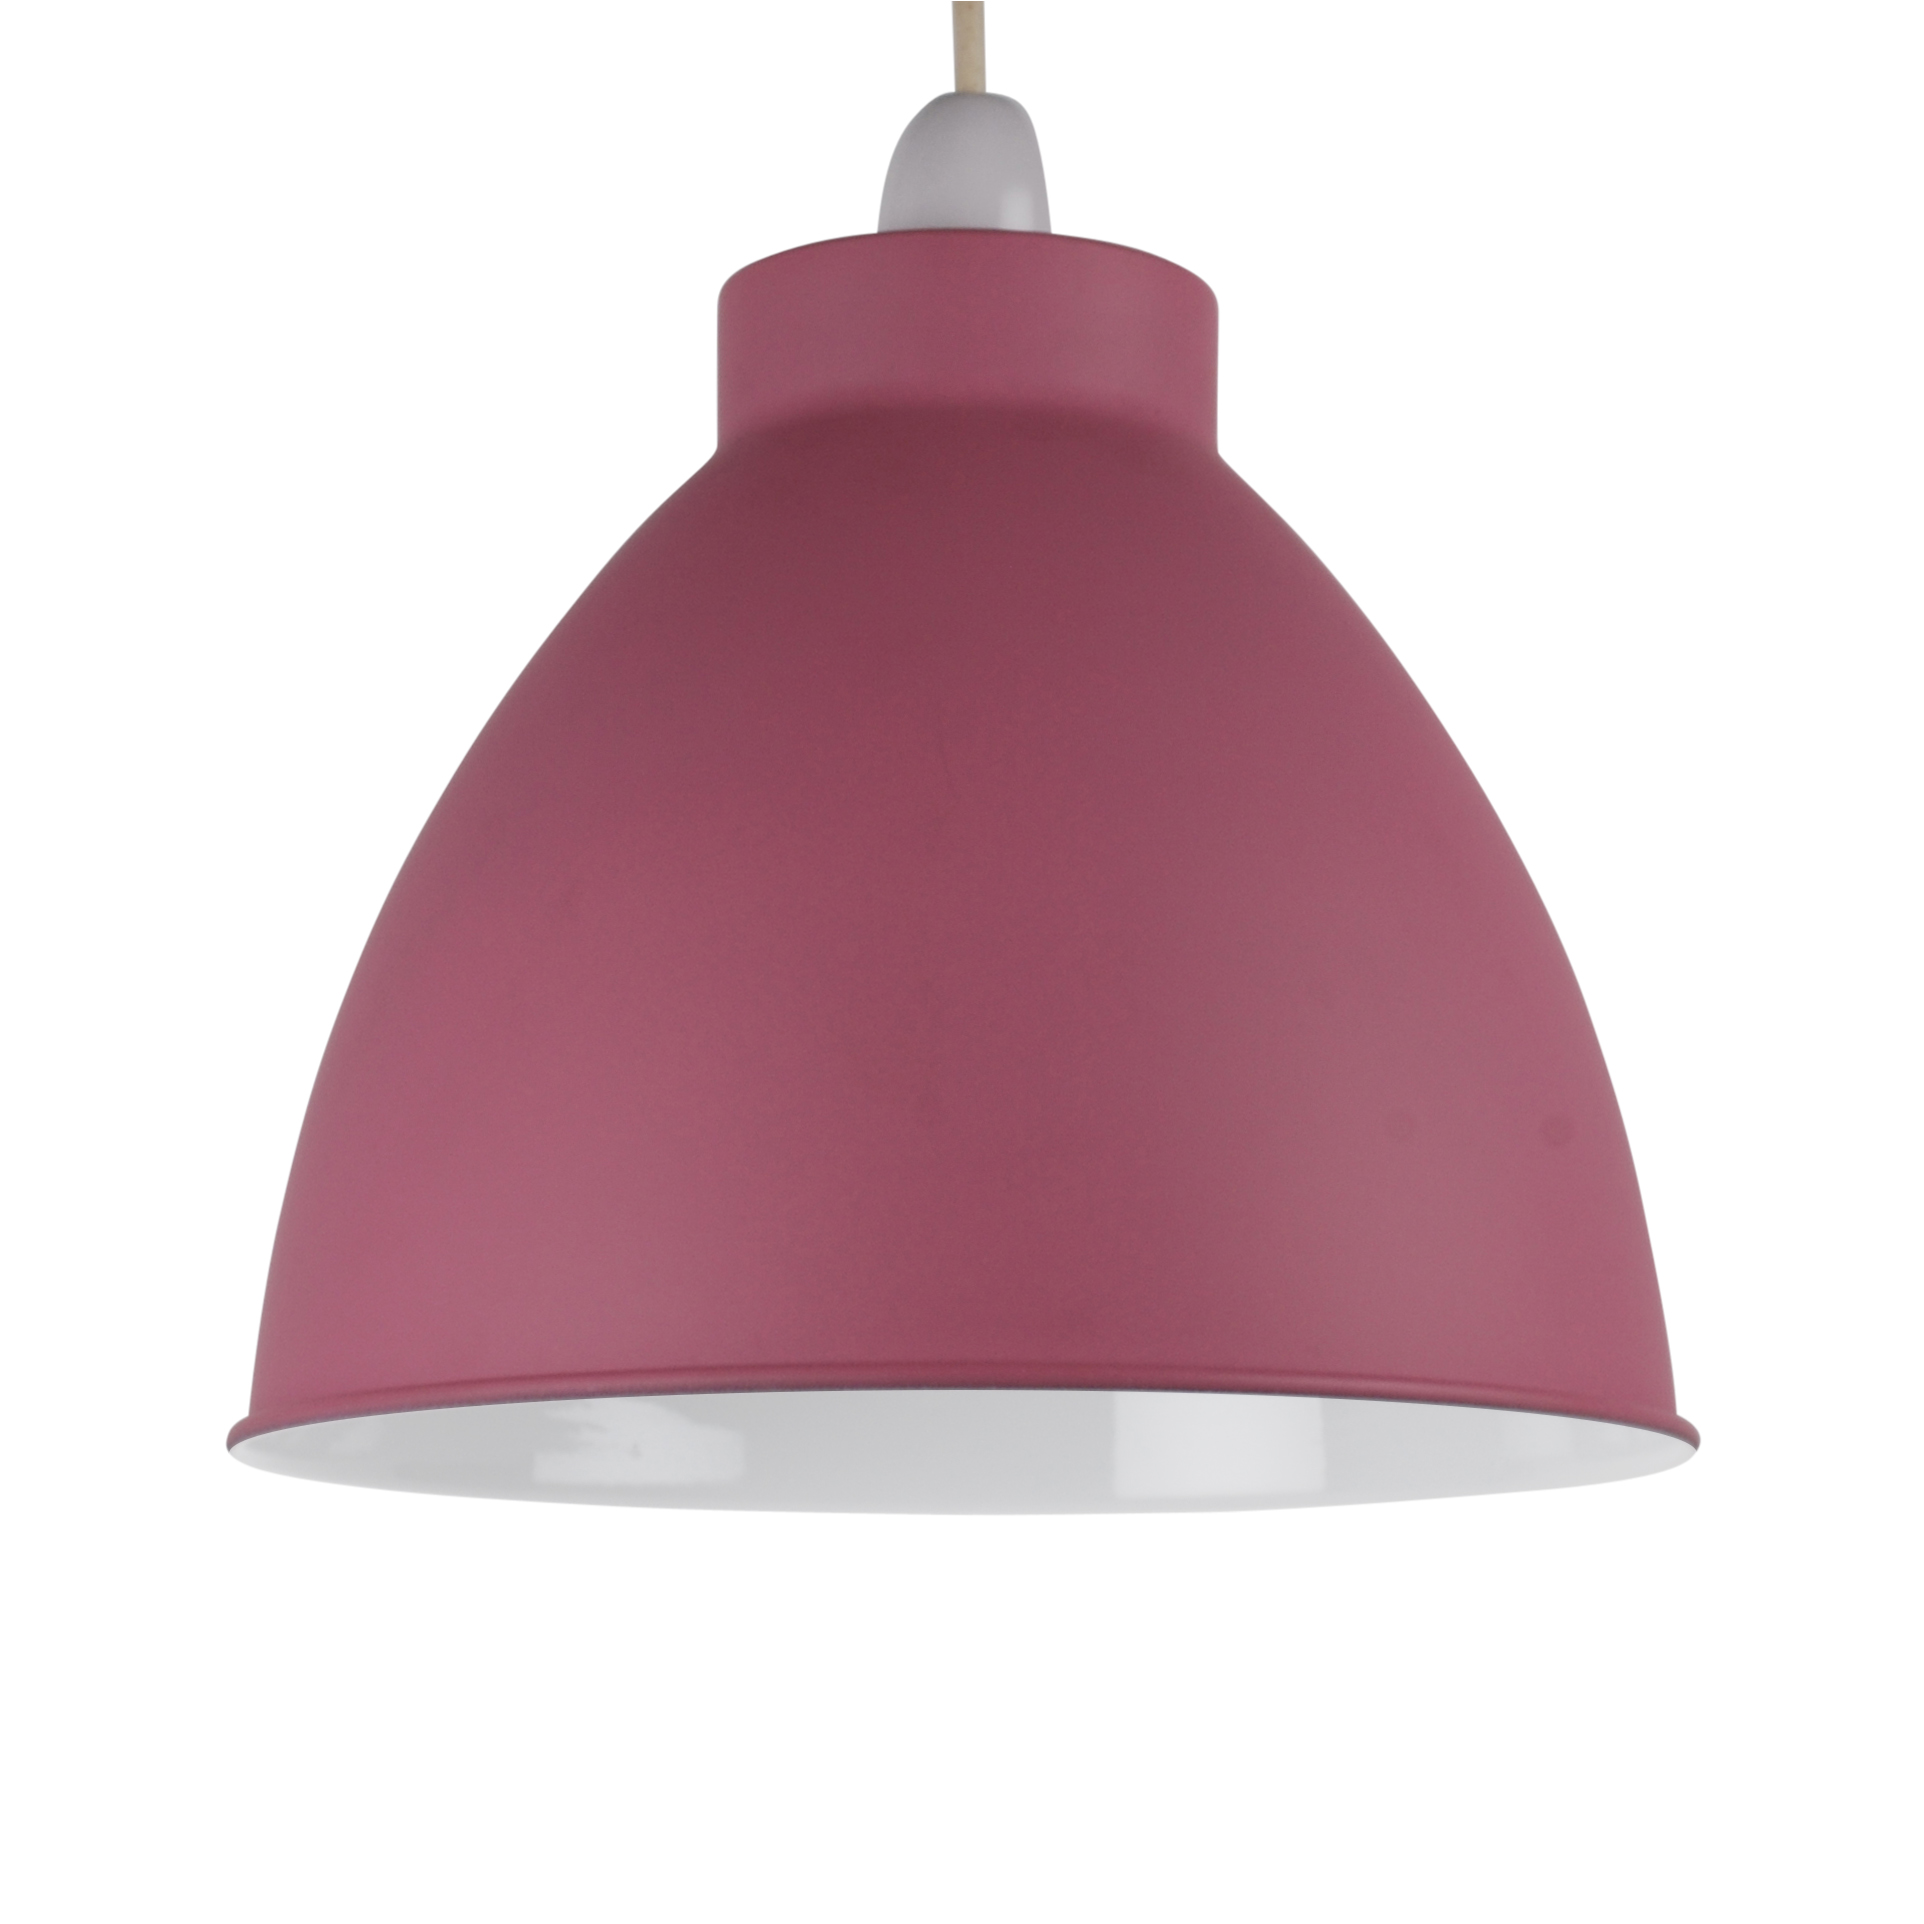 matt pink dome industrial metal coolie ceiling light shade